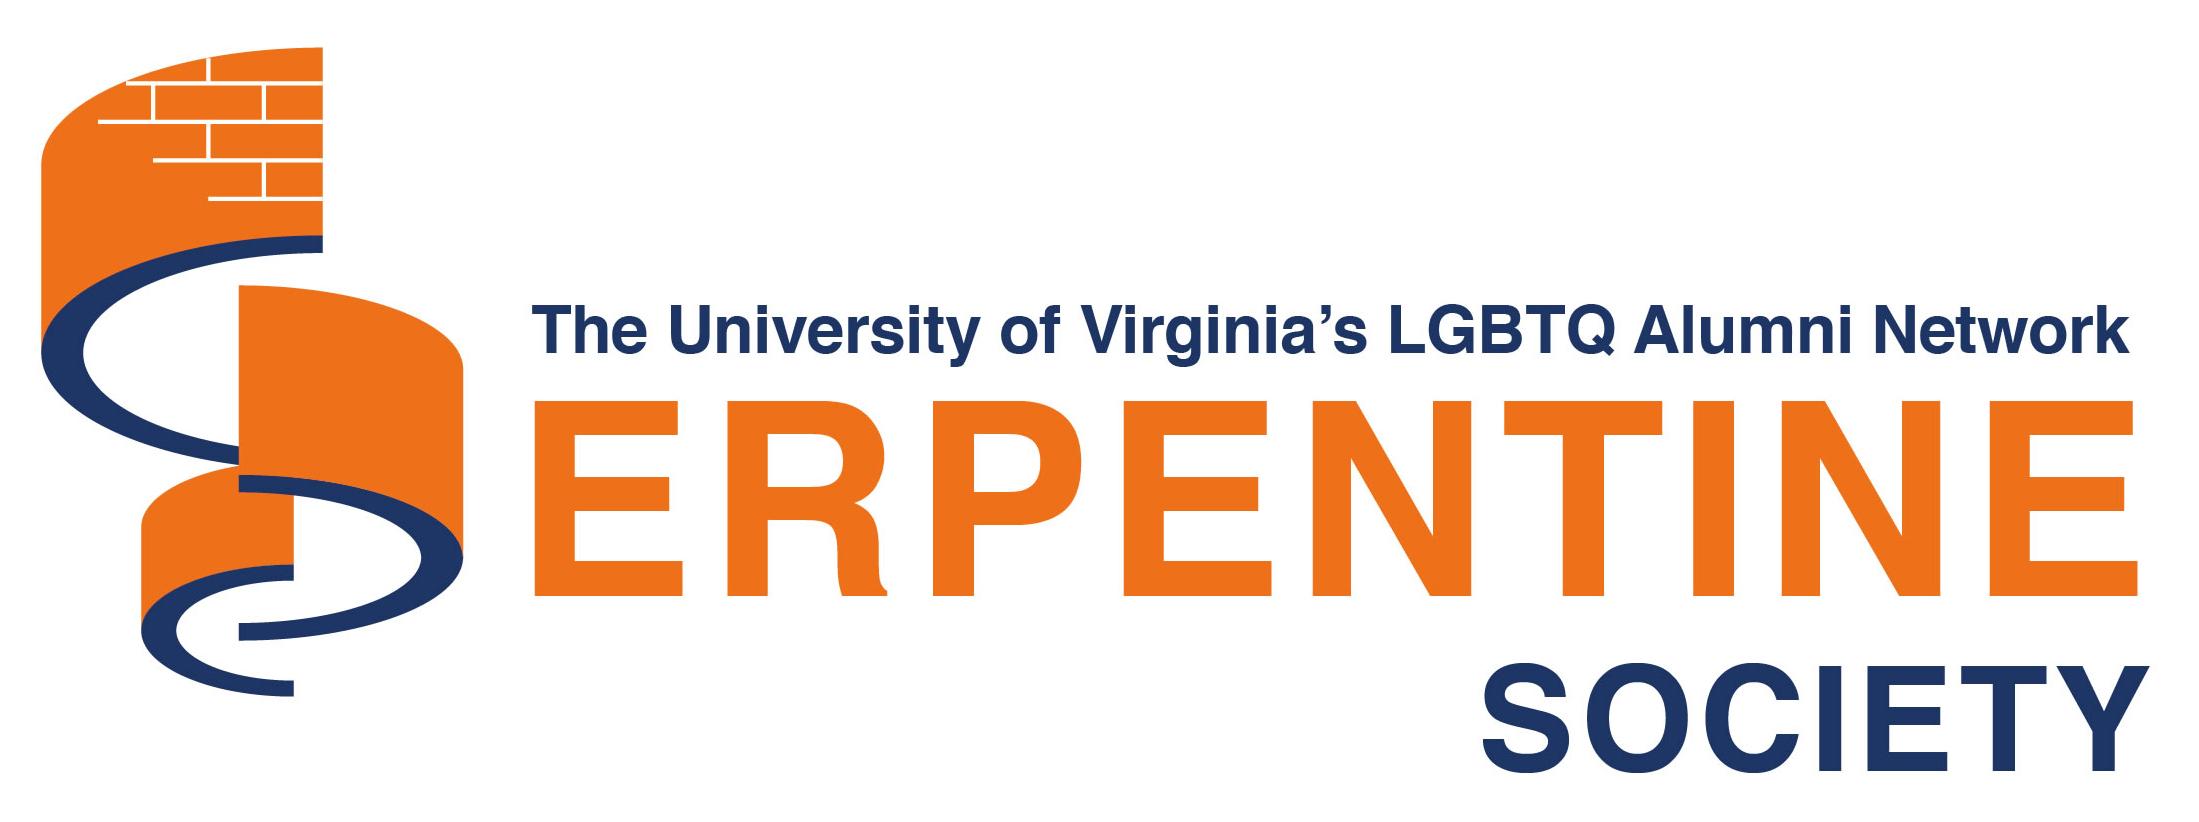 Serpentine Logo.jpg